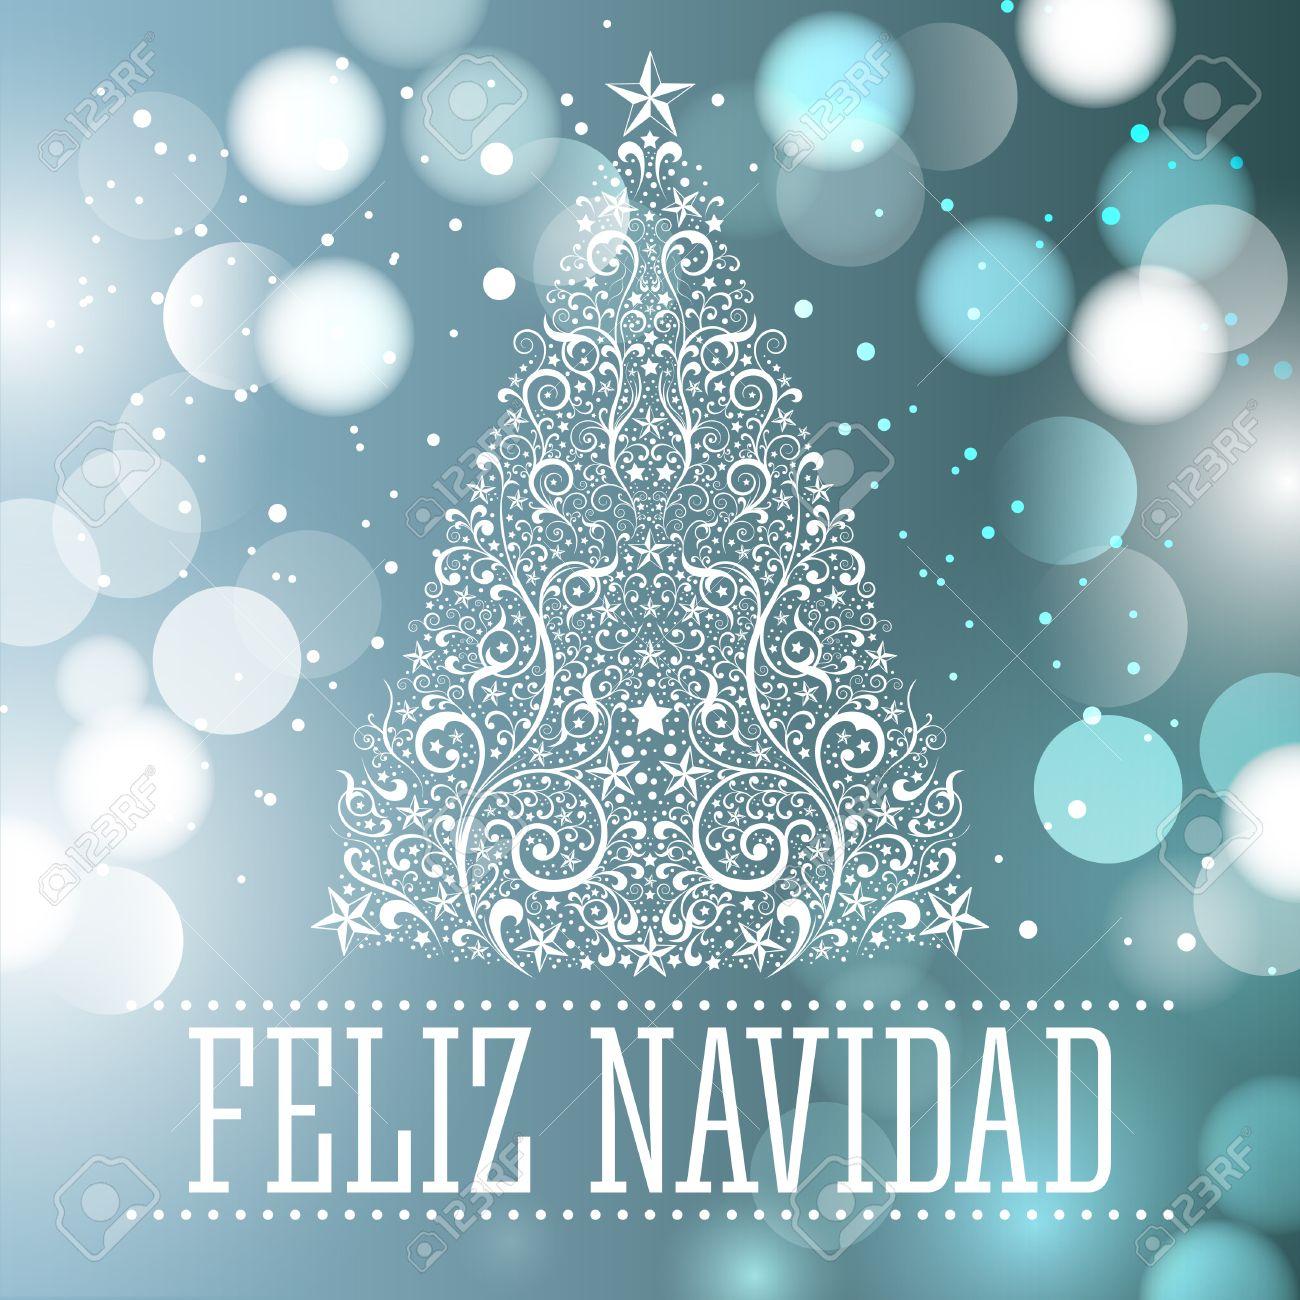 Merry Christmas In Spanish.Feliz Navidad Merry Christmas Spanish Text Card Vector Fantasy